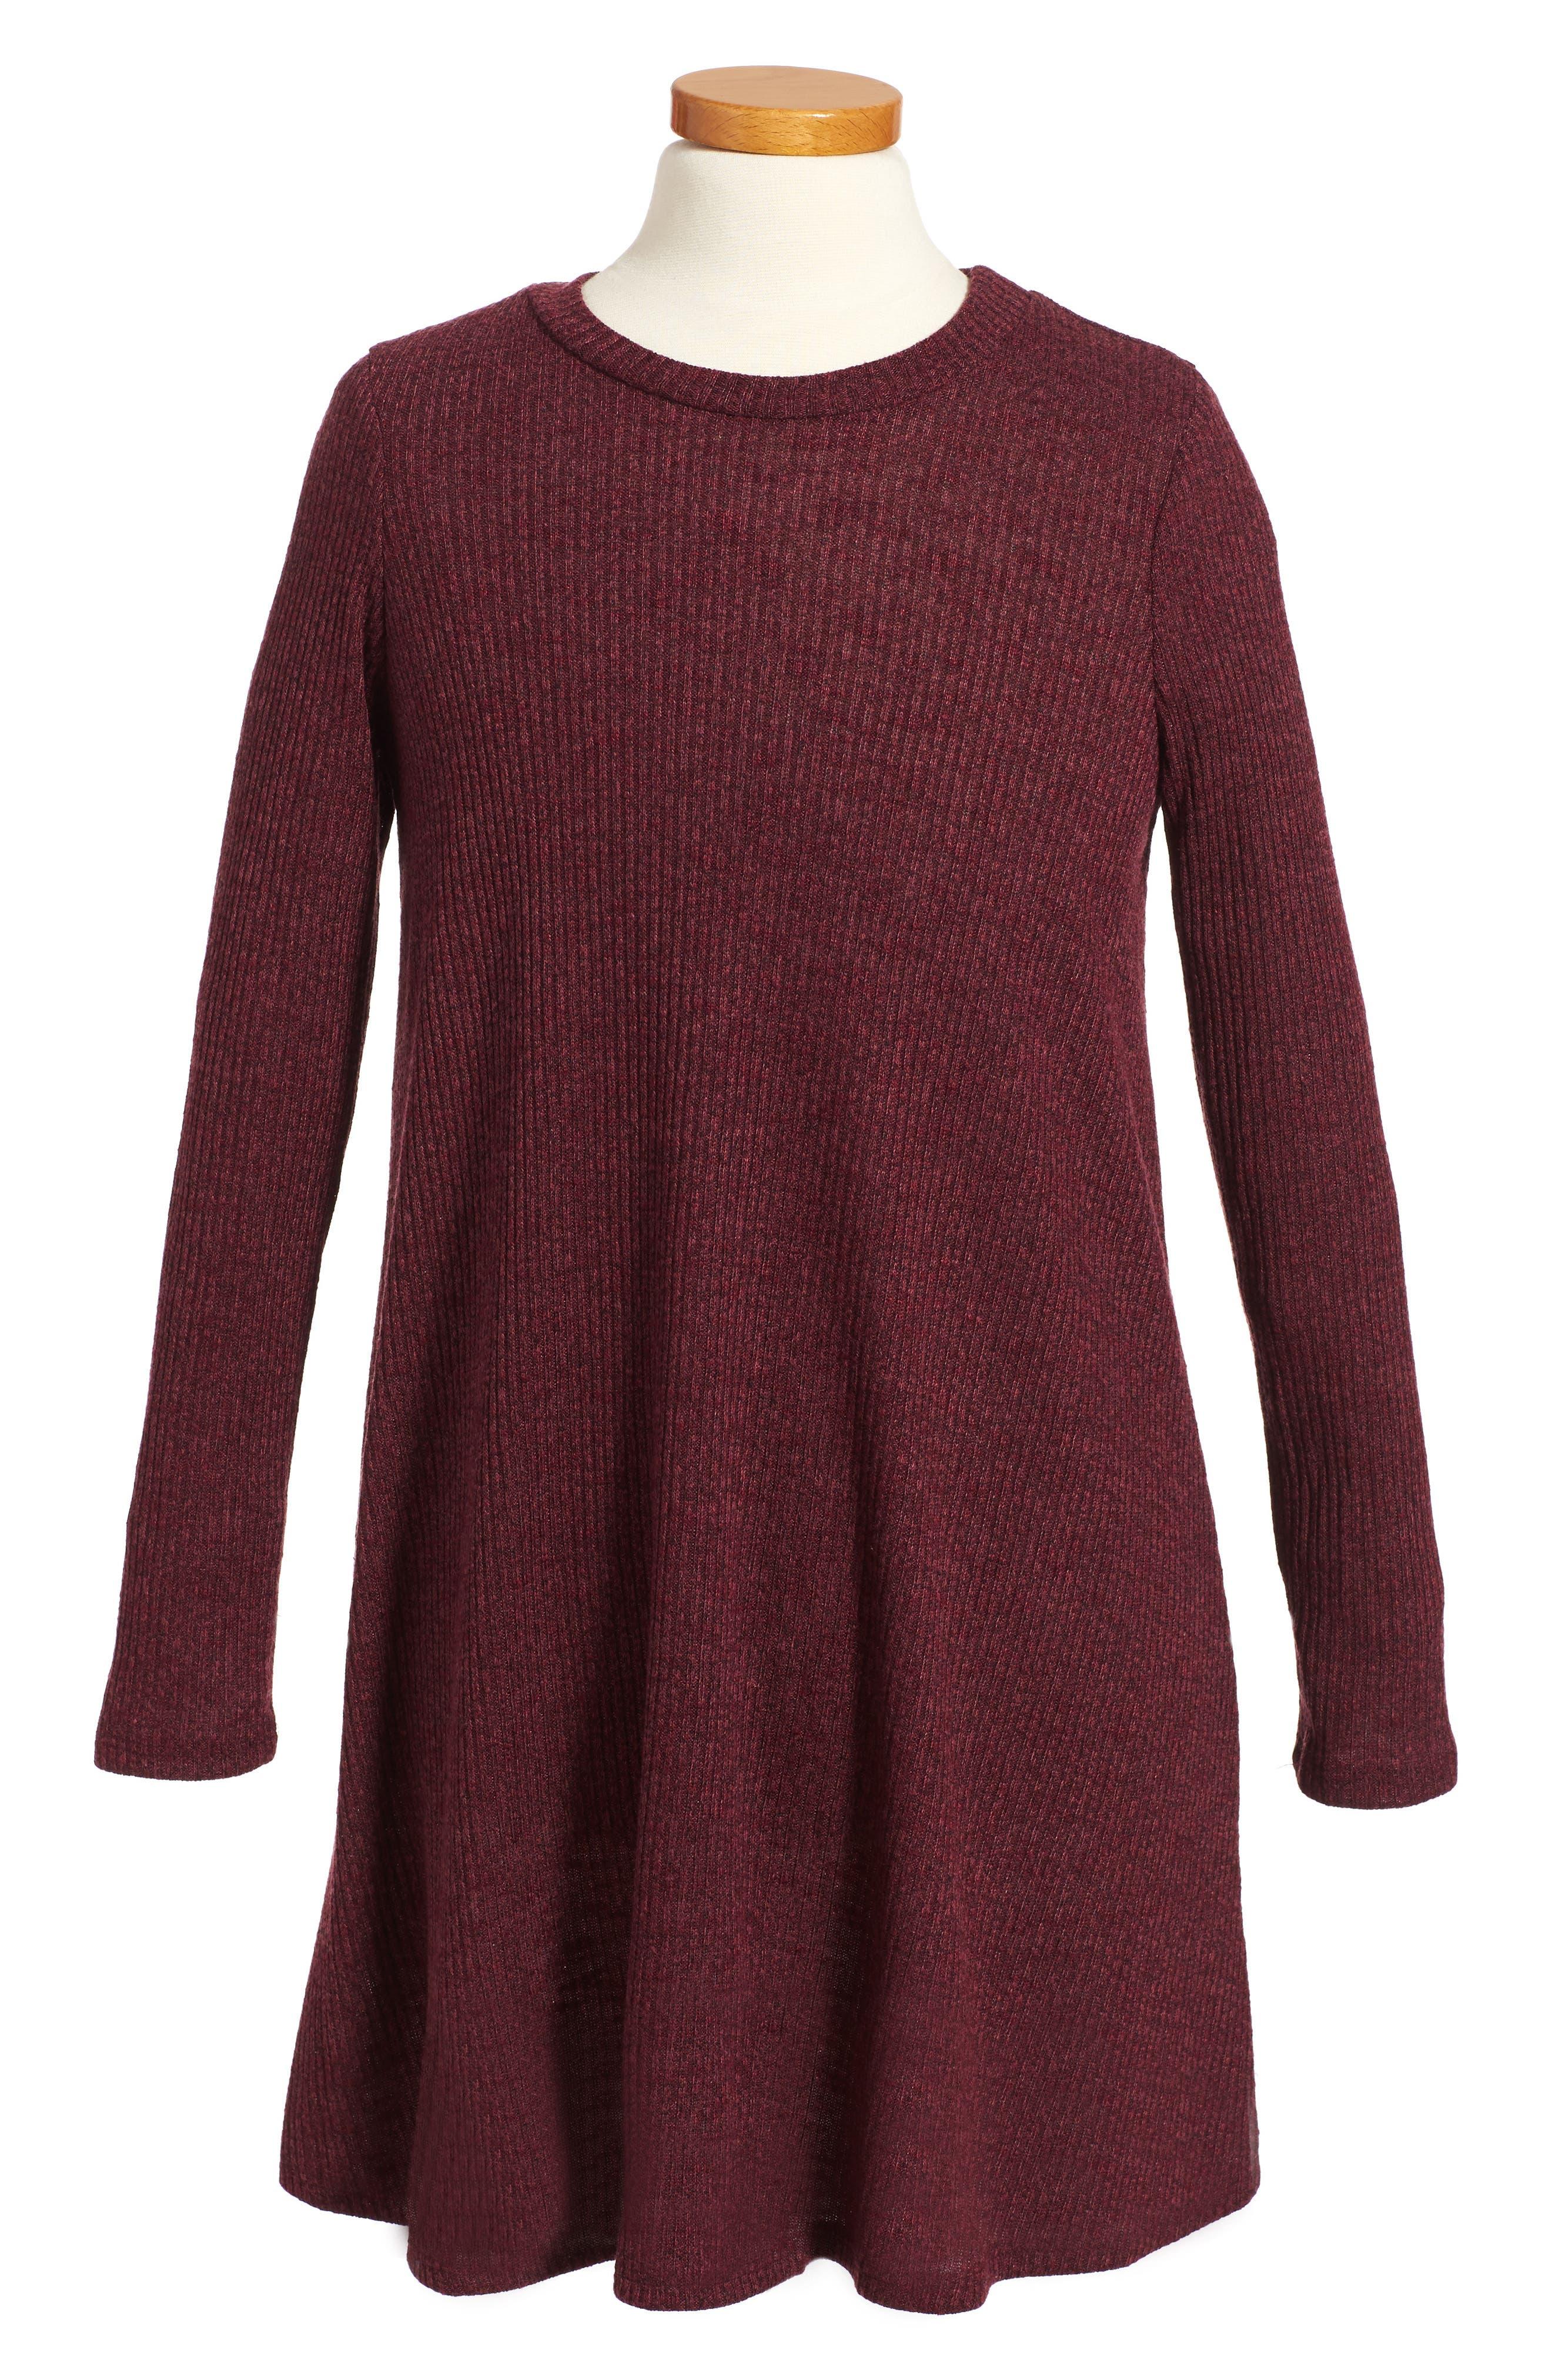 Alternate Image 1 Selected - Soprano Rib Knit Sweater Dress (Big Girls)